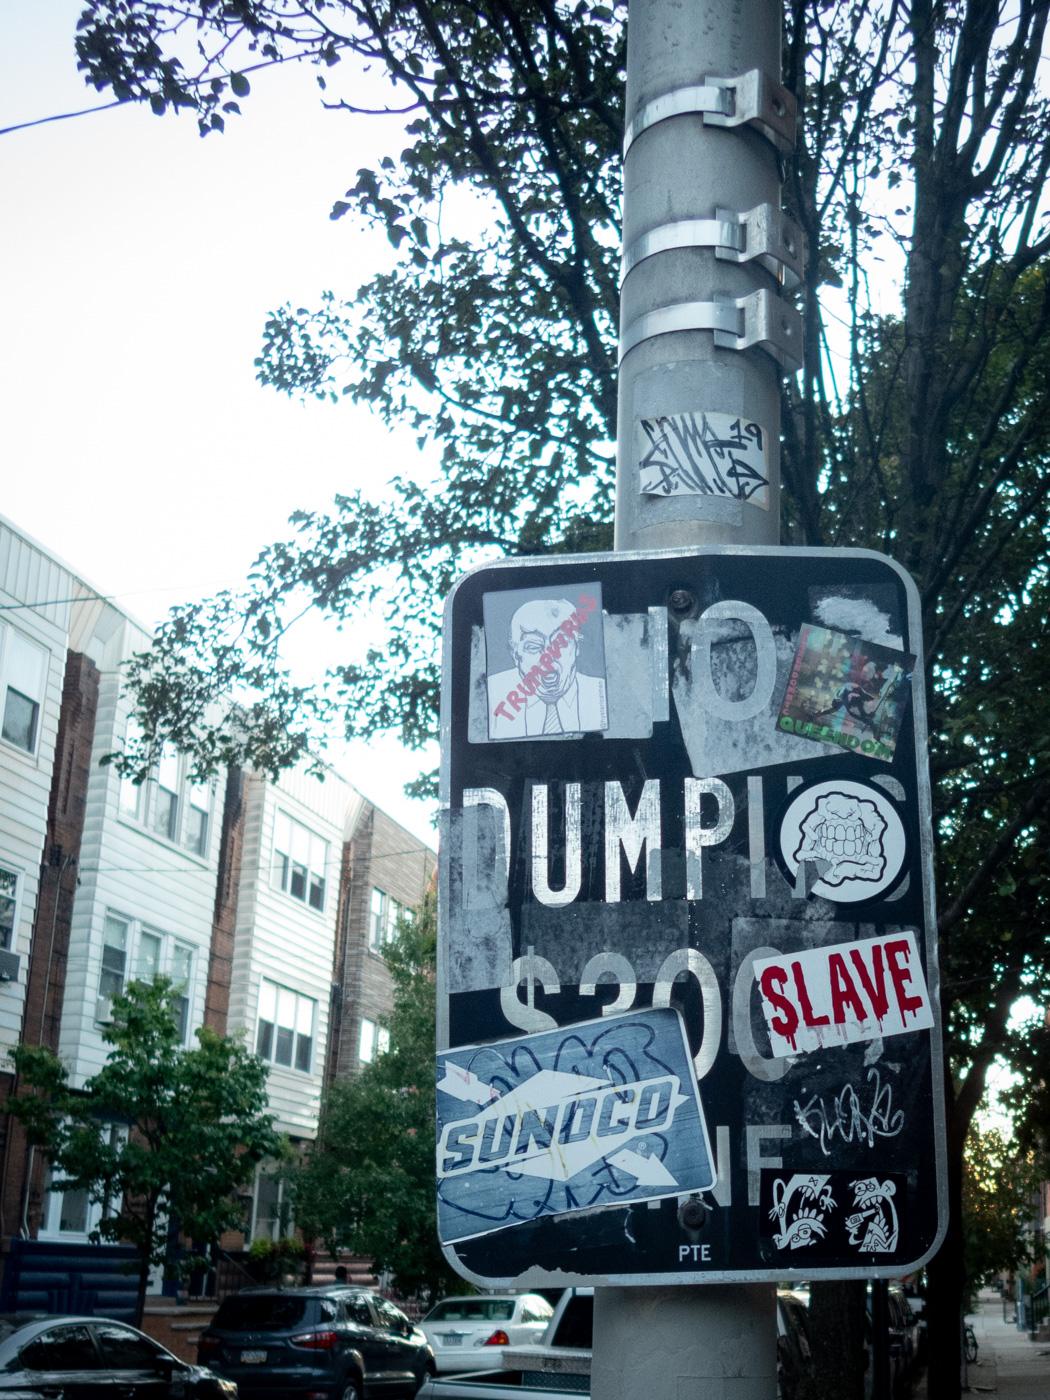 Trumpvirus Slave